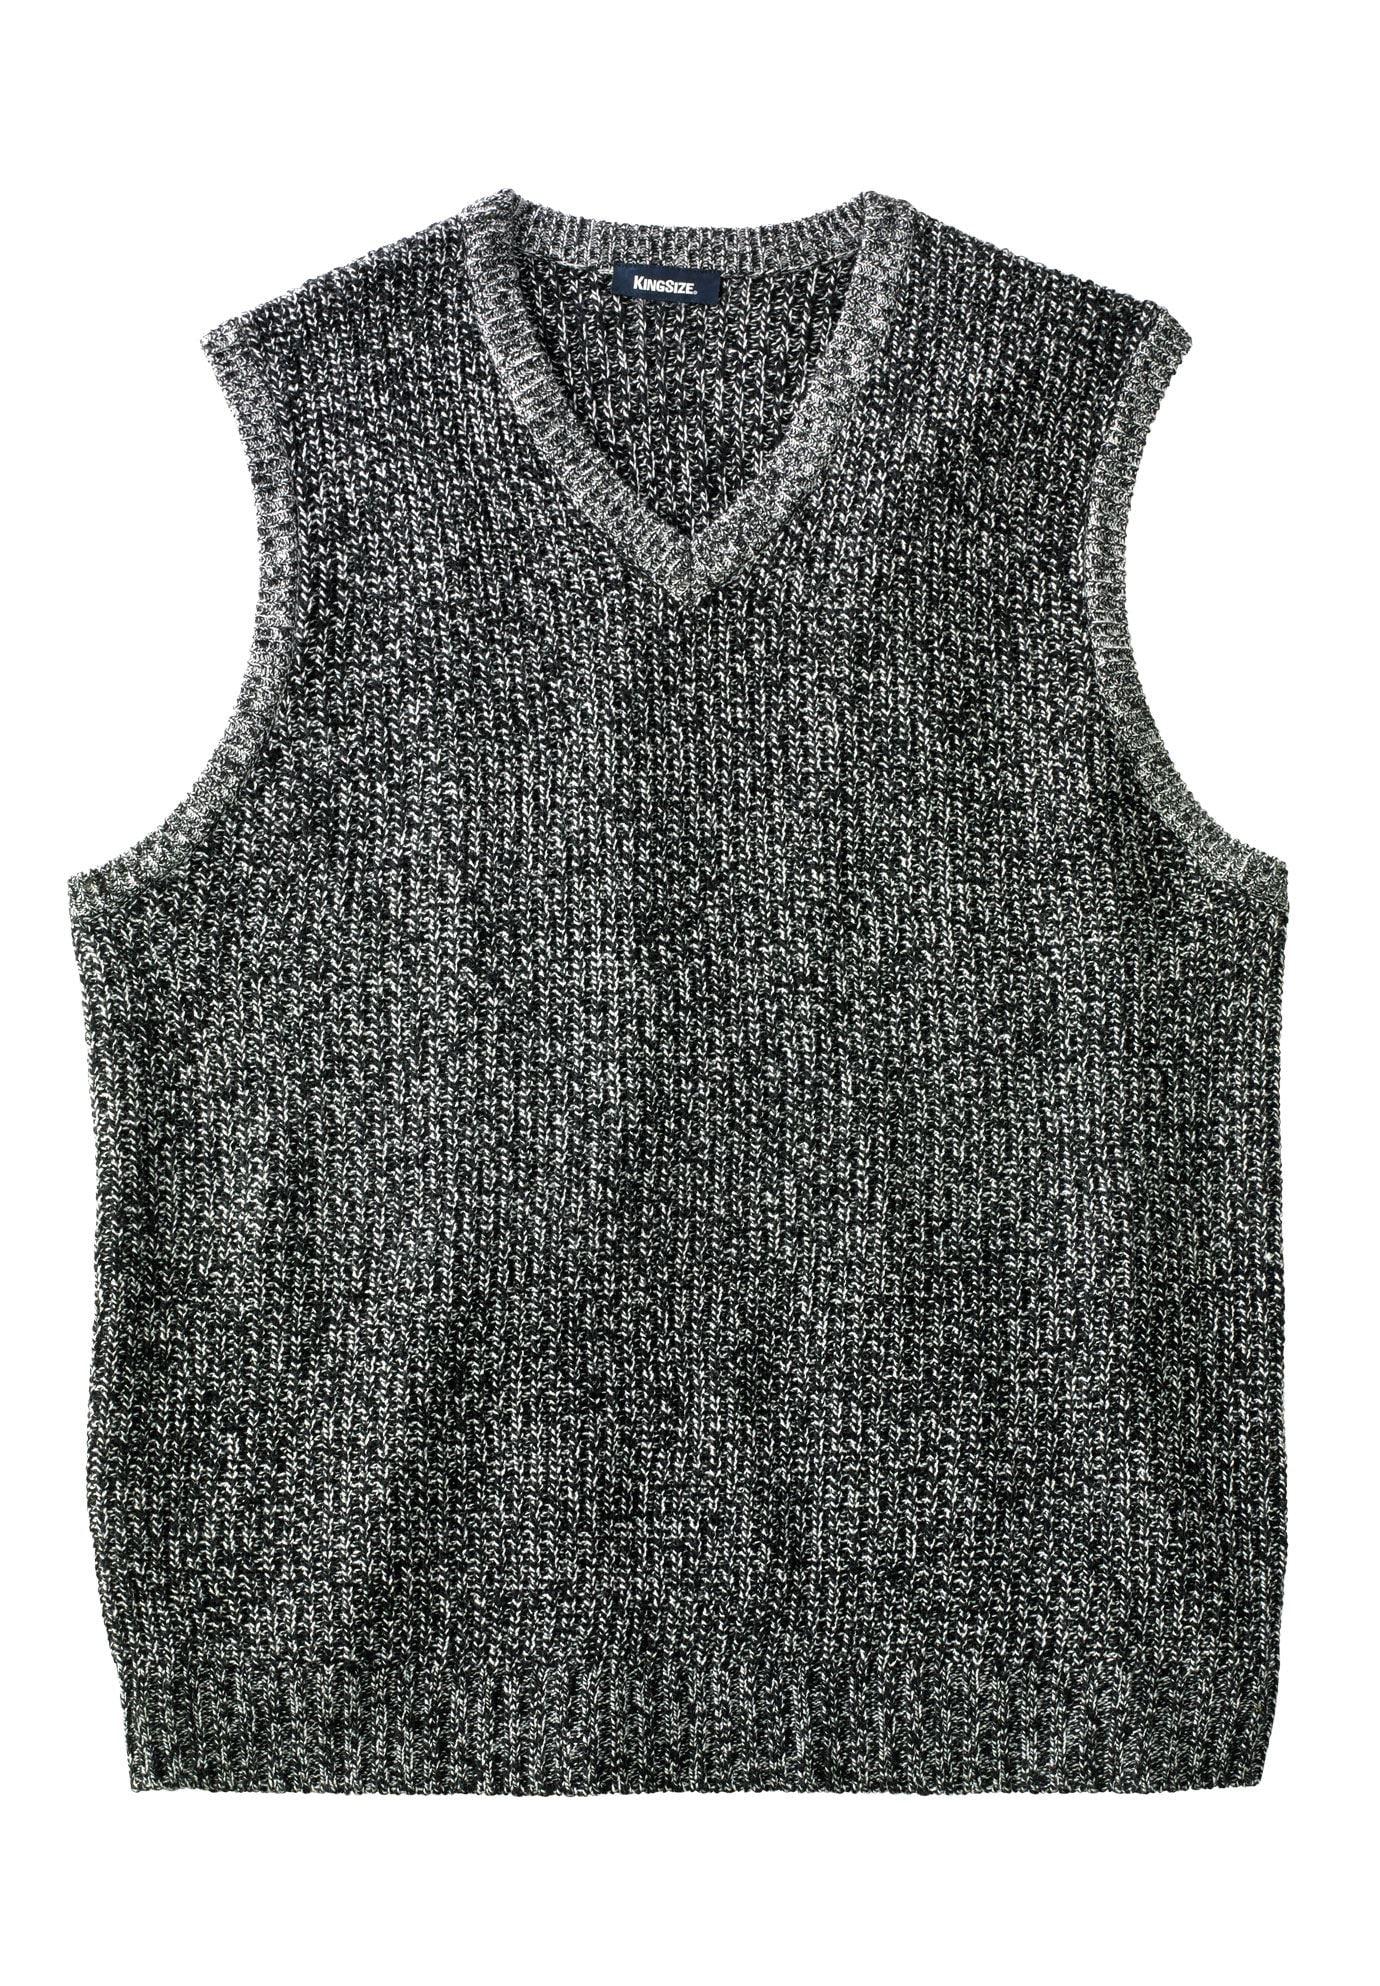 Men's Big & Tall Shaker Knit V-neck Sweater Vest